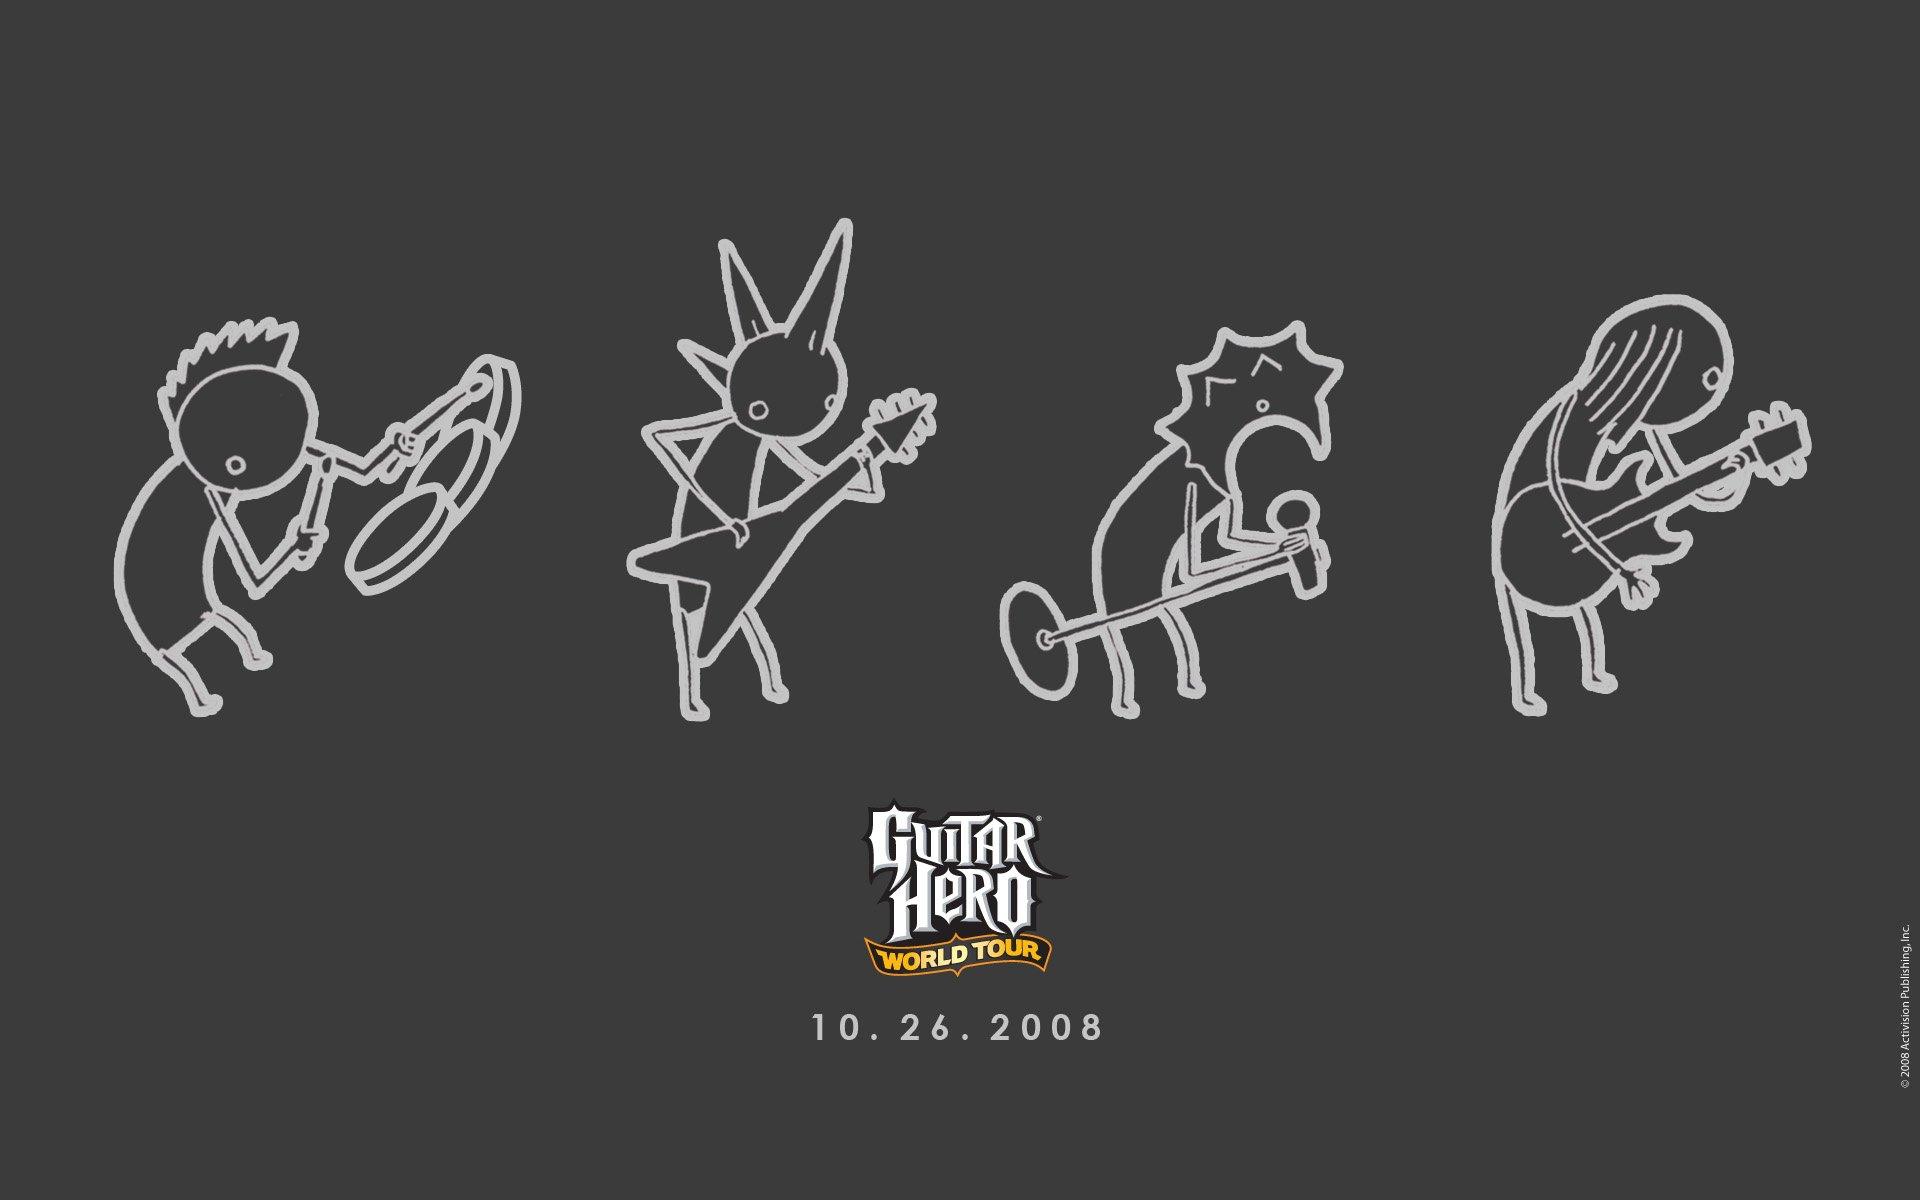 Fine Guitar Hero Images & Wallpapers Dismas Chaimson